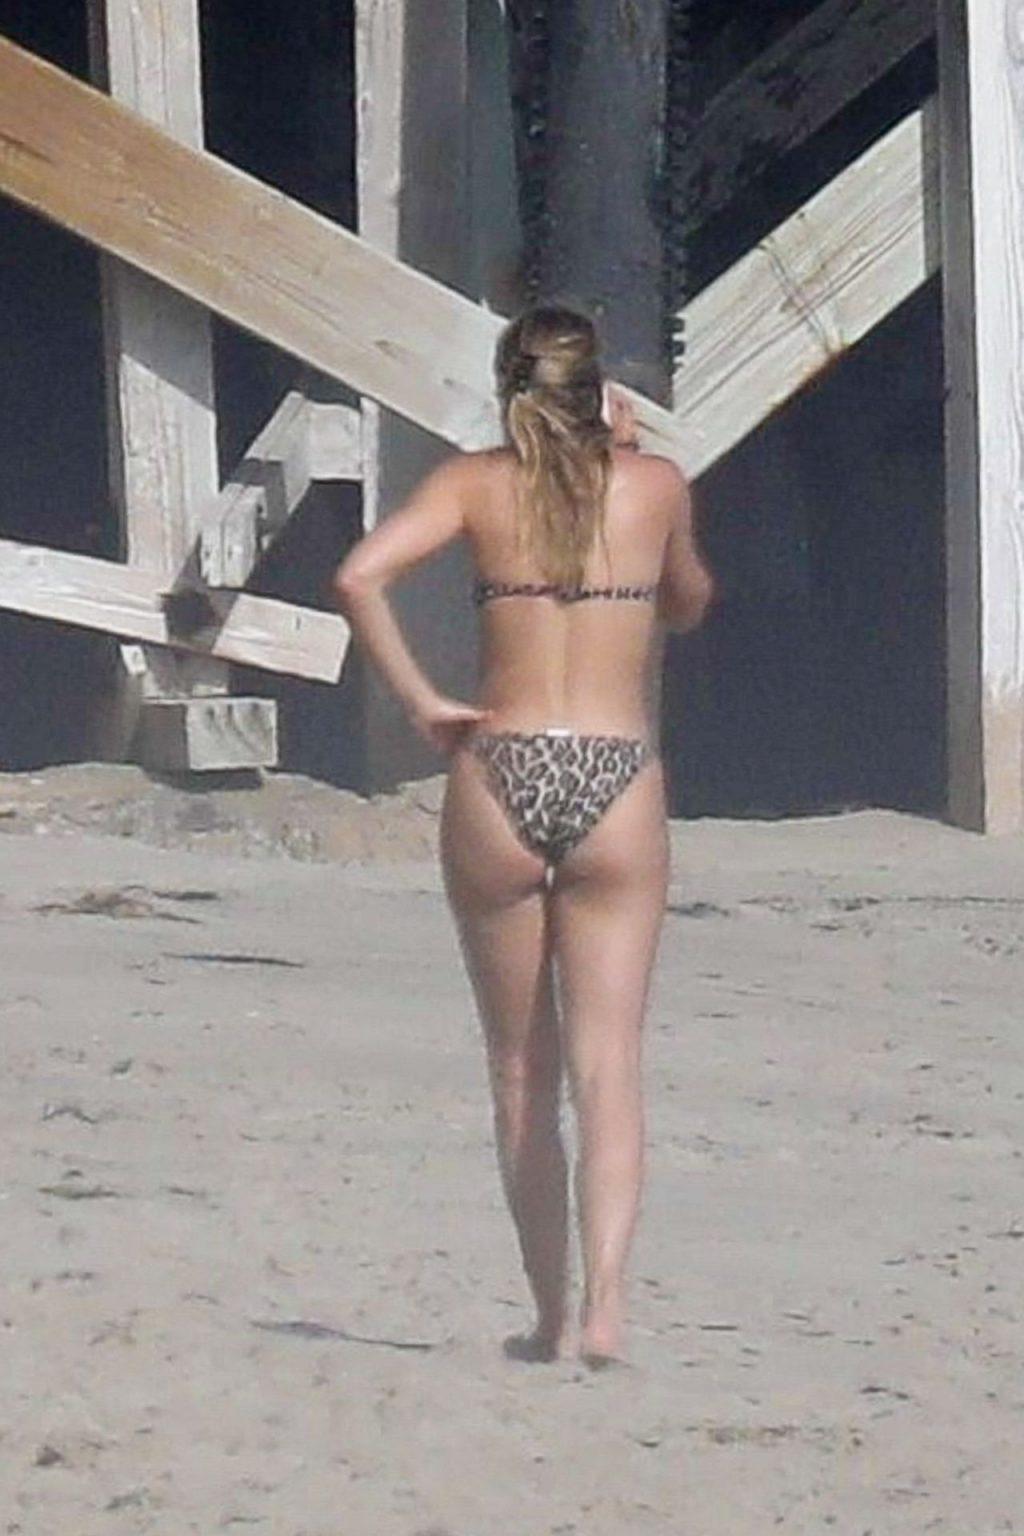 Sofia Richie Wears a Leopard Print Bikini Tanning with Scott Disick in Malibu (39 Photos)